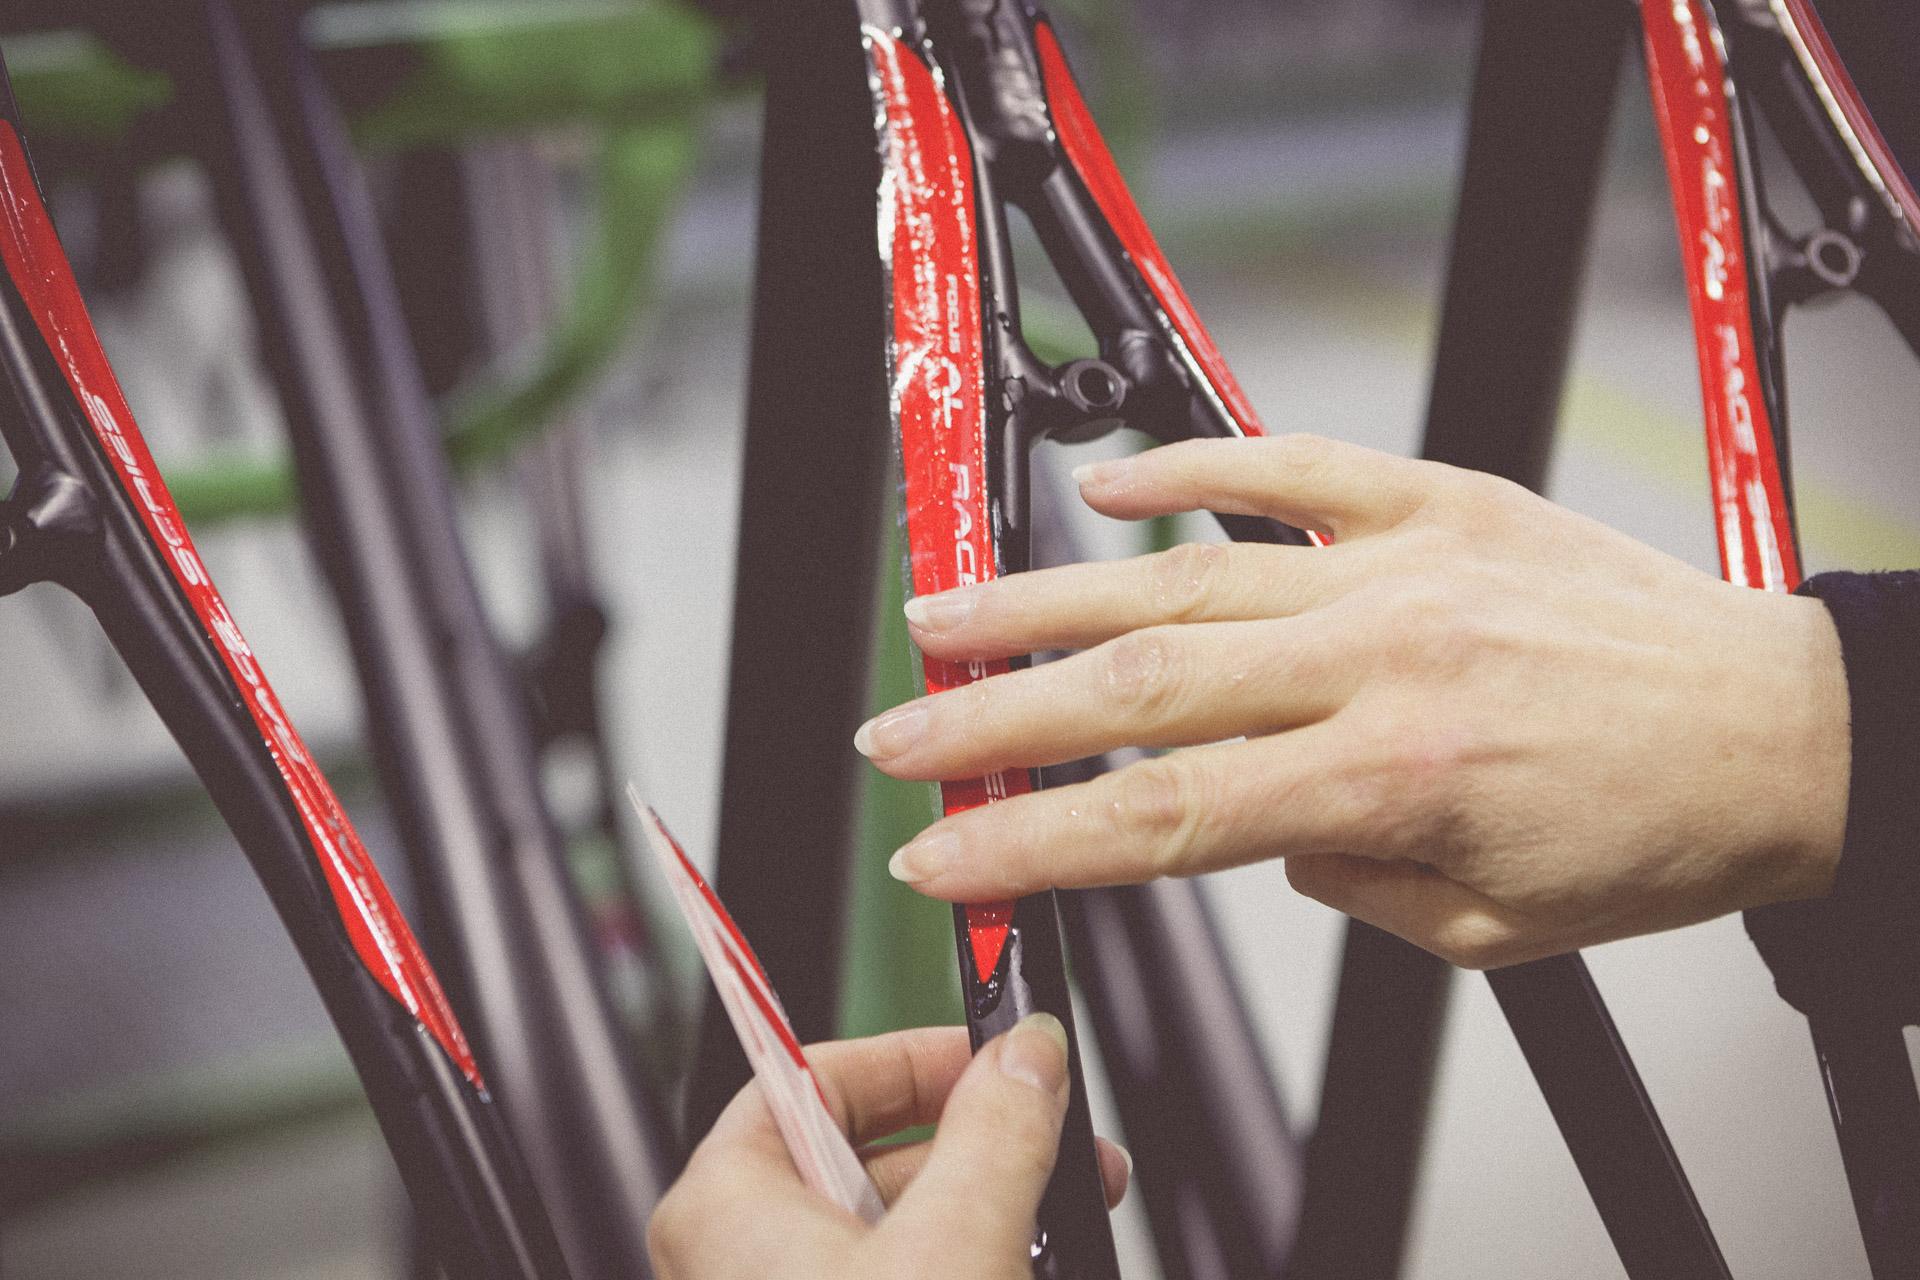 40-Derby-Cycle-Werke-Fahrradproduktion